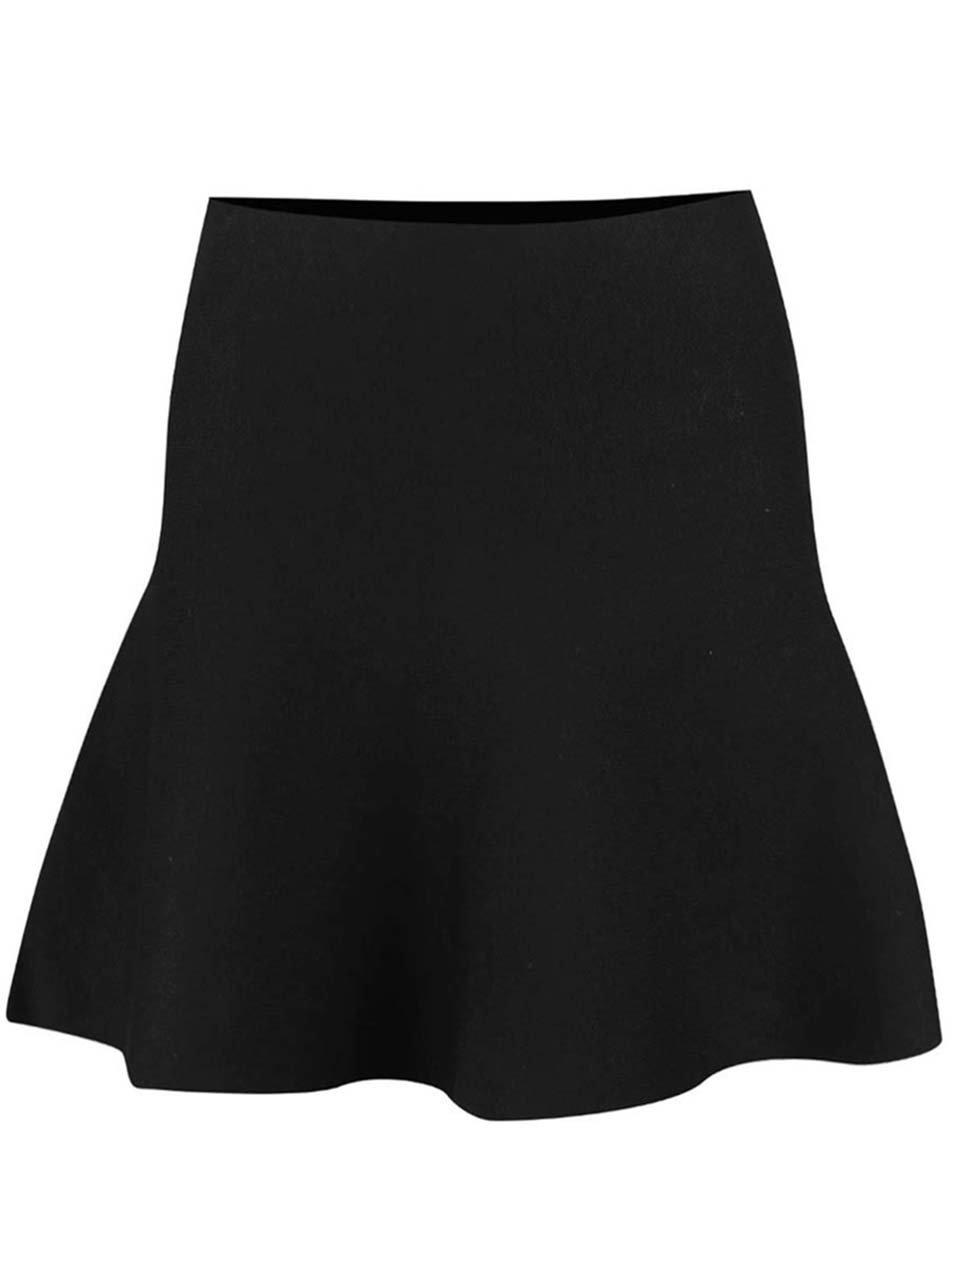 Černá minisukně Vero Moda Cirus